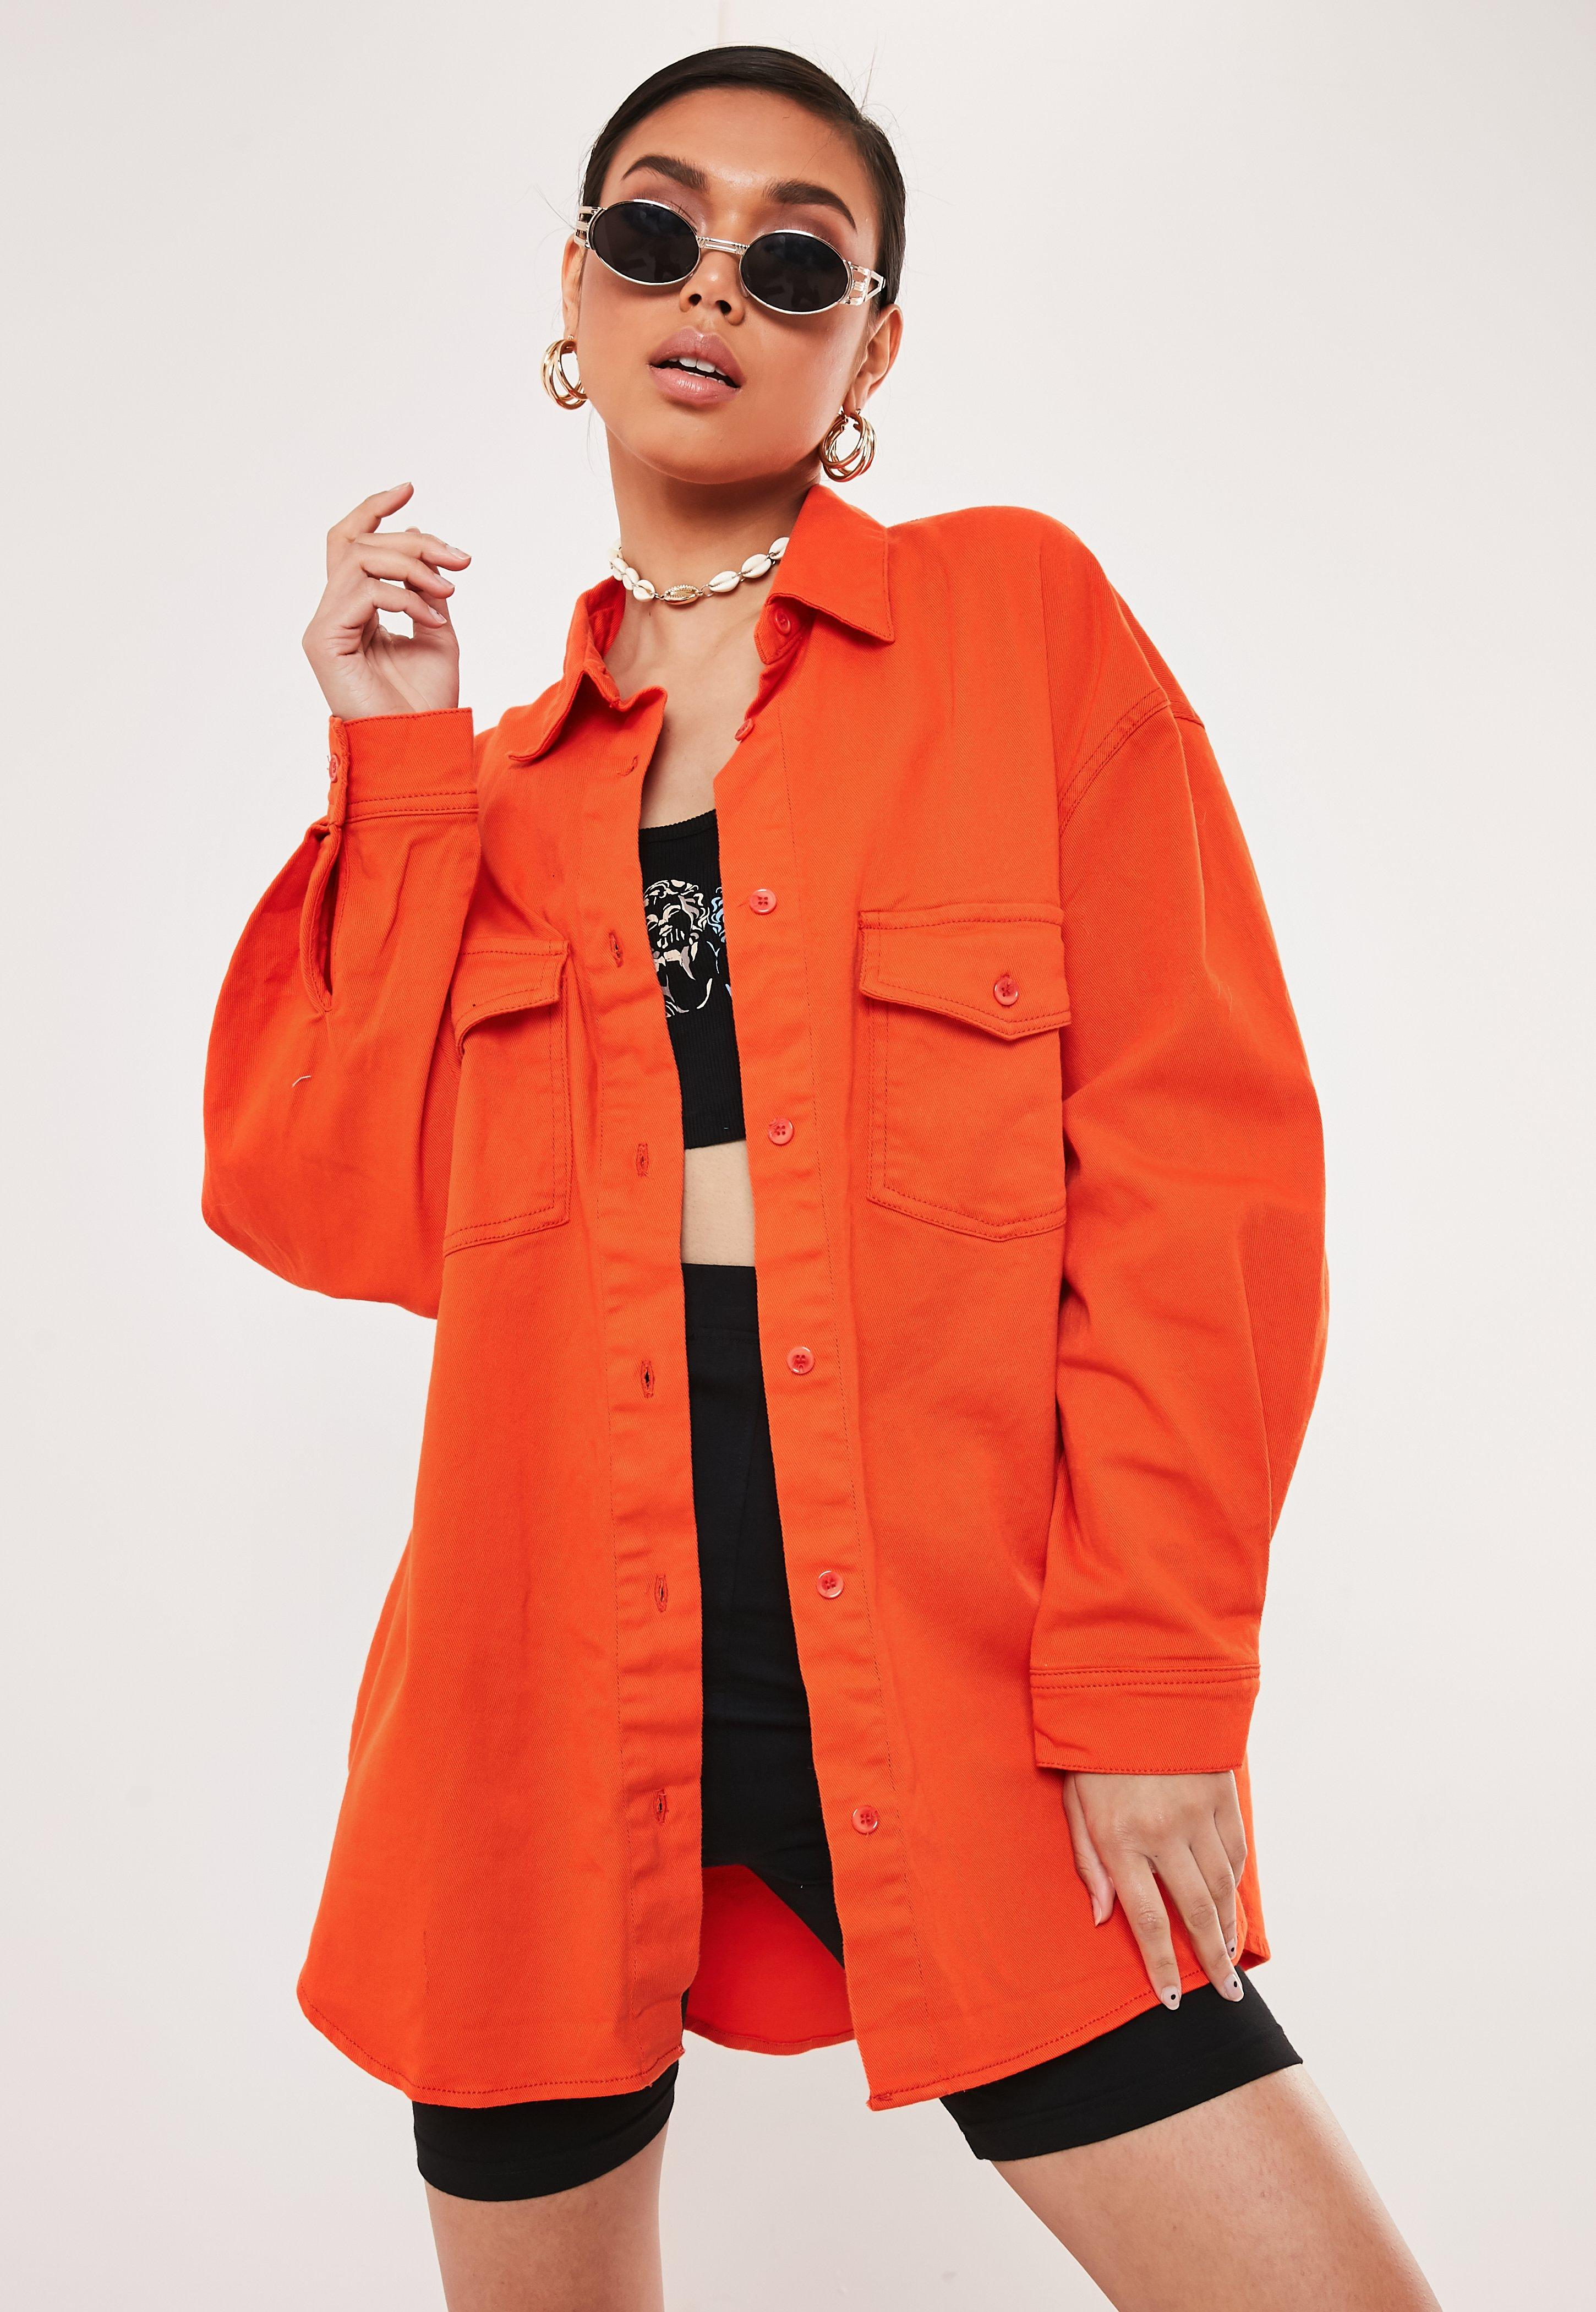 a1186802 Women's Shirts | Satin & Oversized Shirts - Missguided